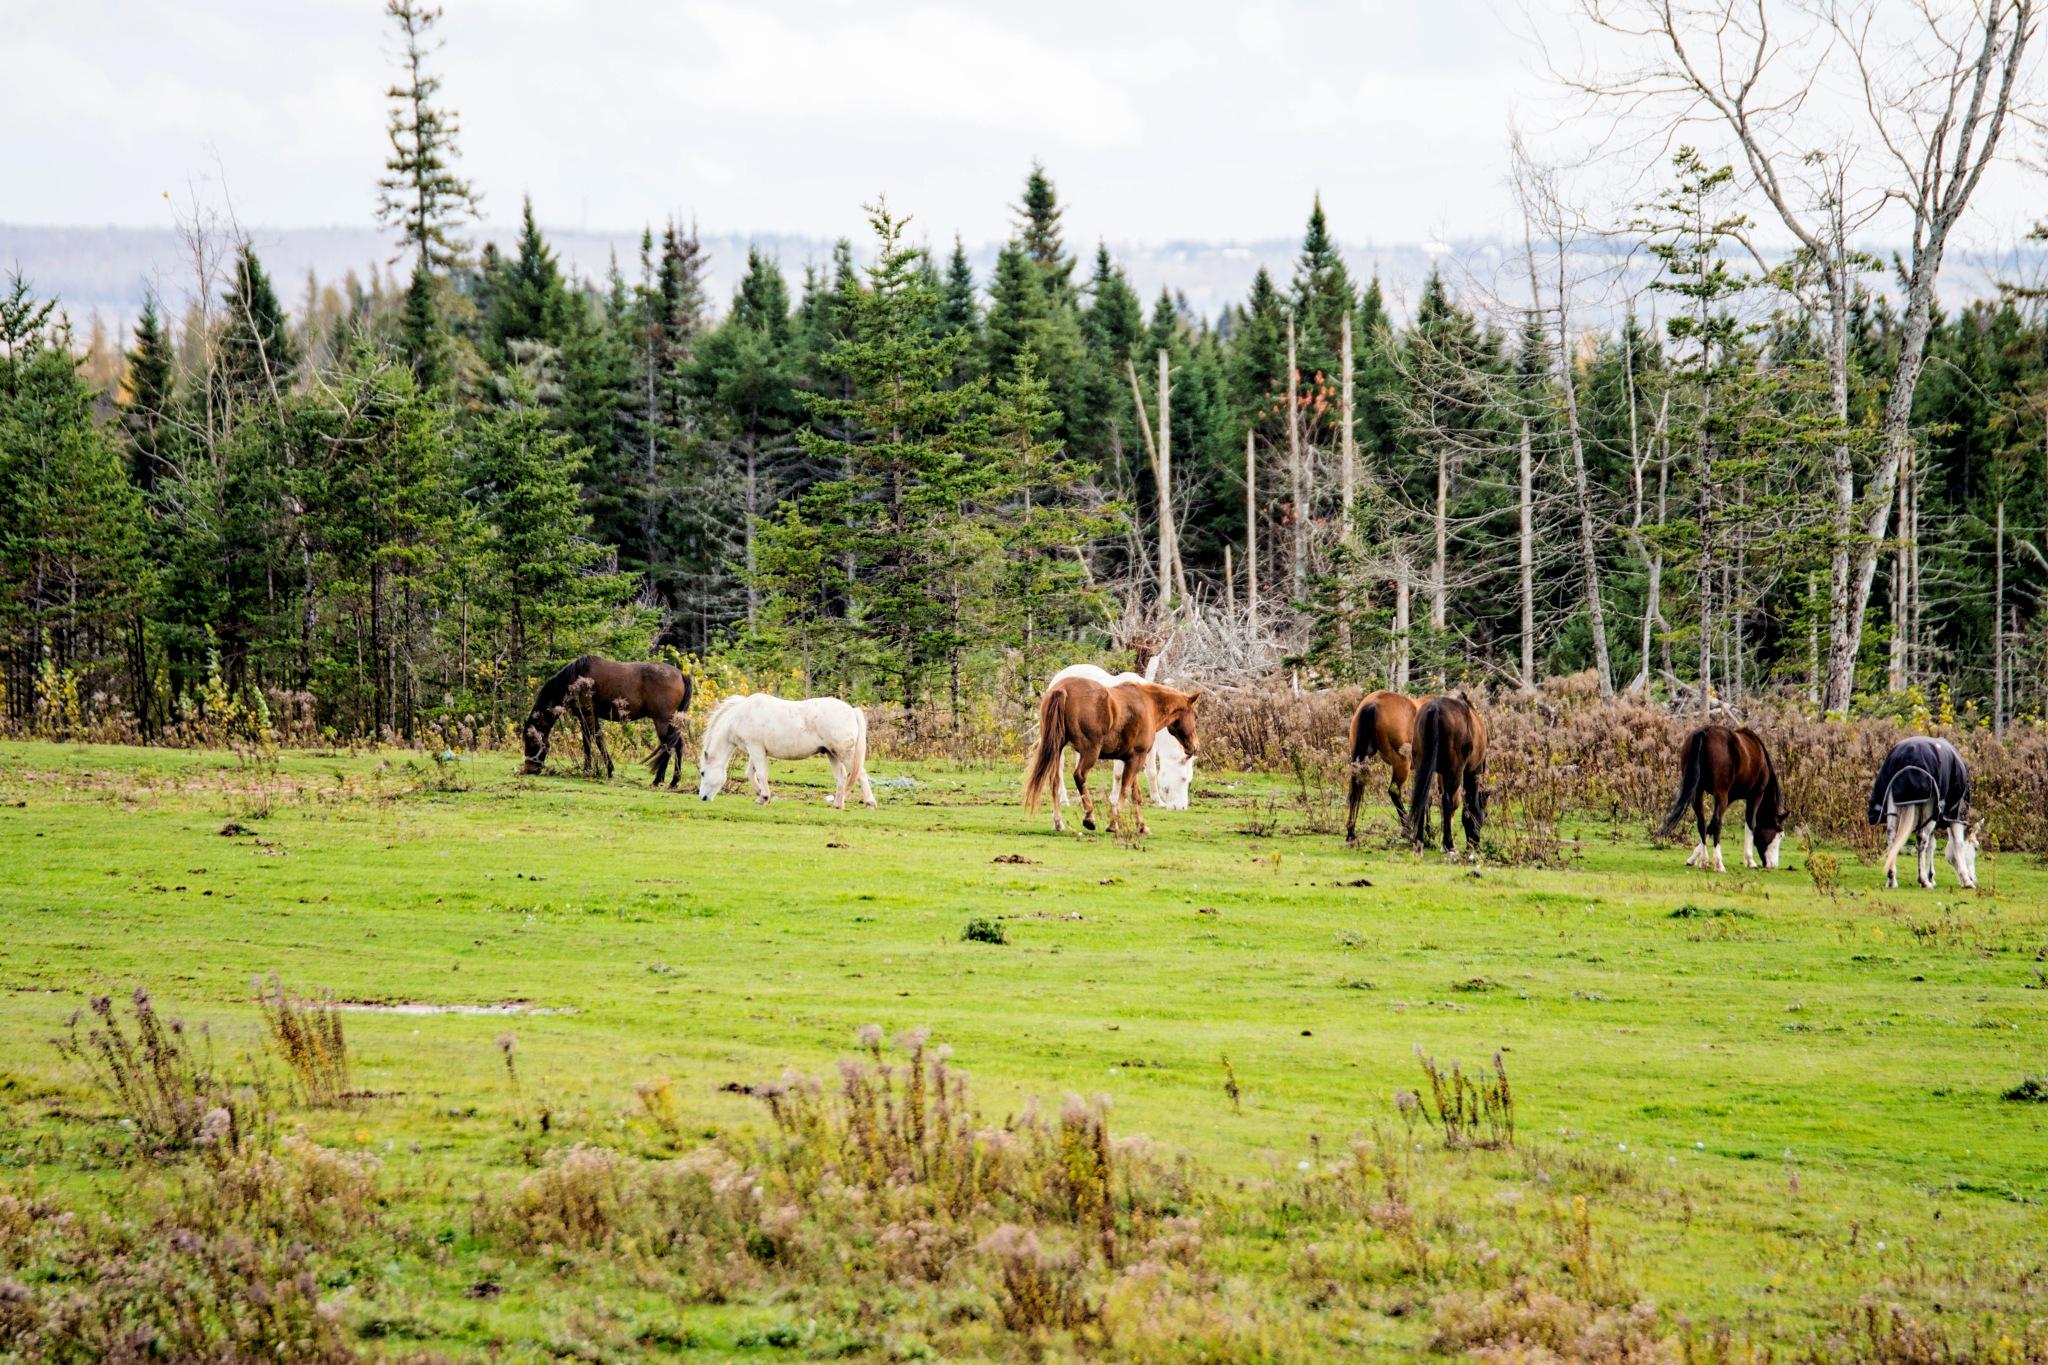 The Herd by Wayne L. Talbot